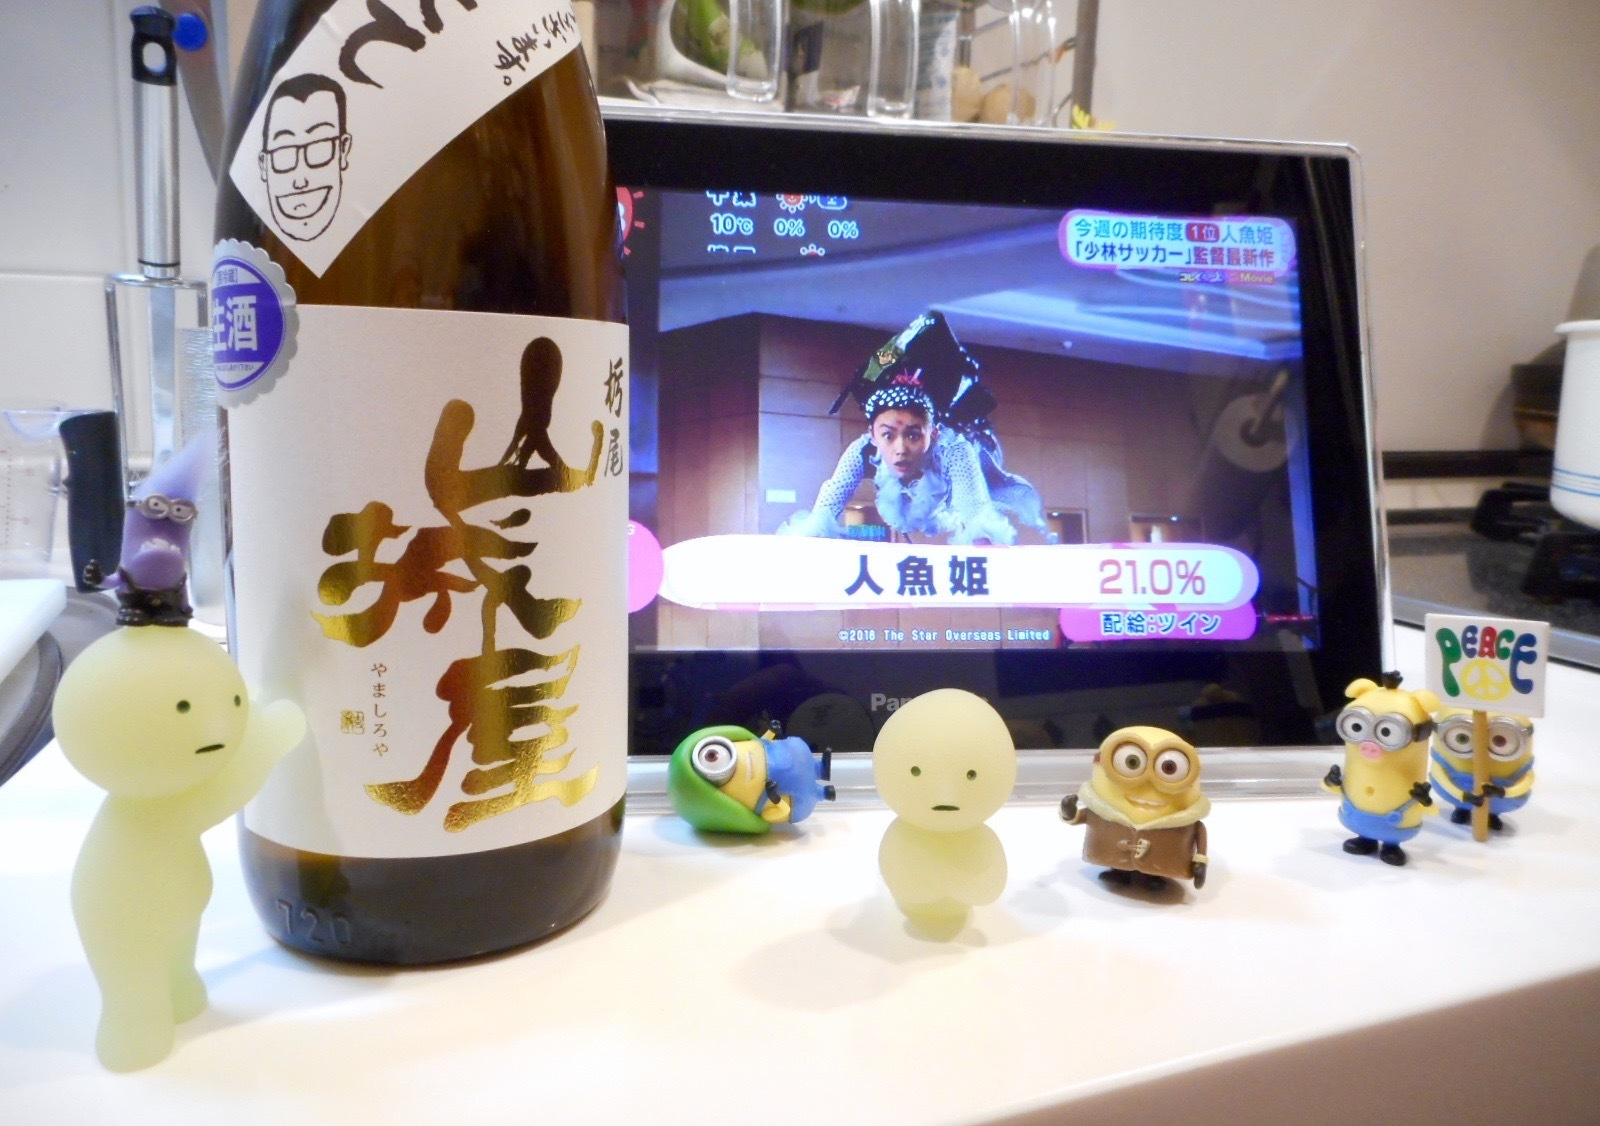 yamashiroya_hatsushibori28by1.jpg